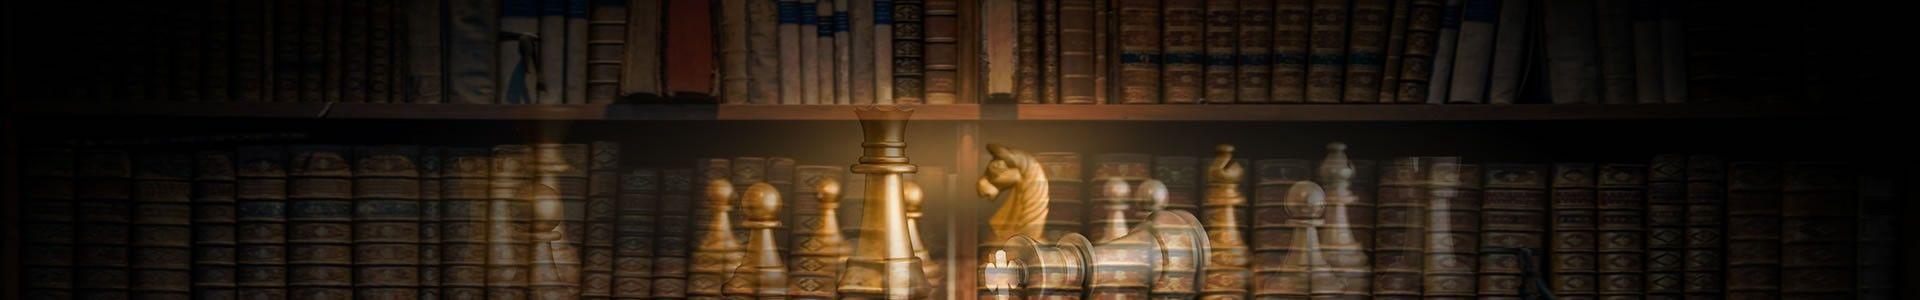 Libros de Ajedrez y Ebooks | Ajedrez21